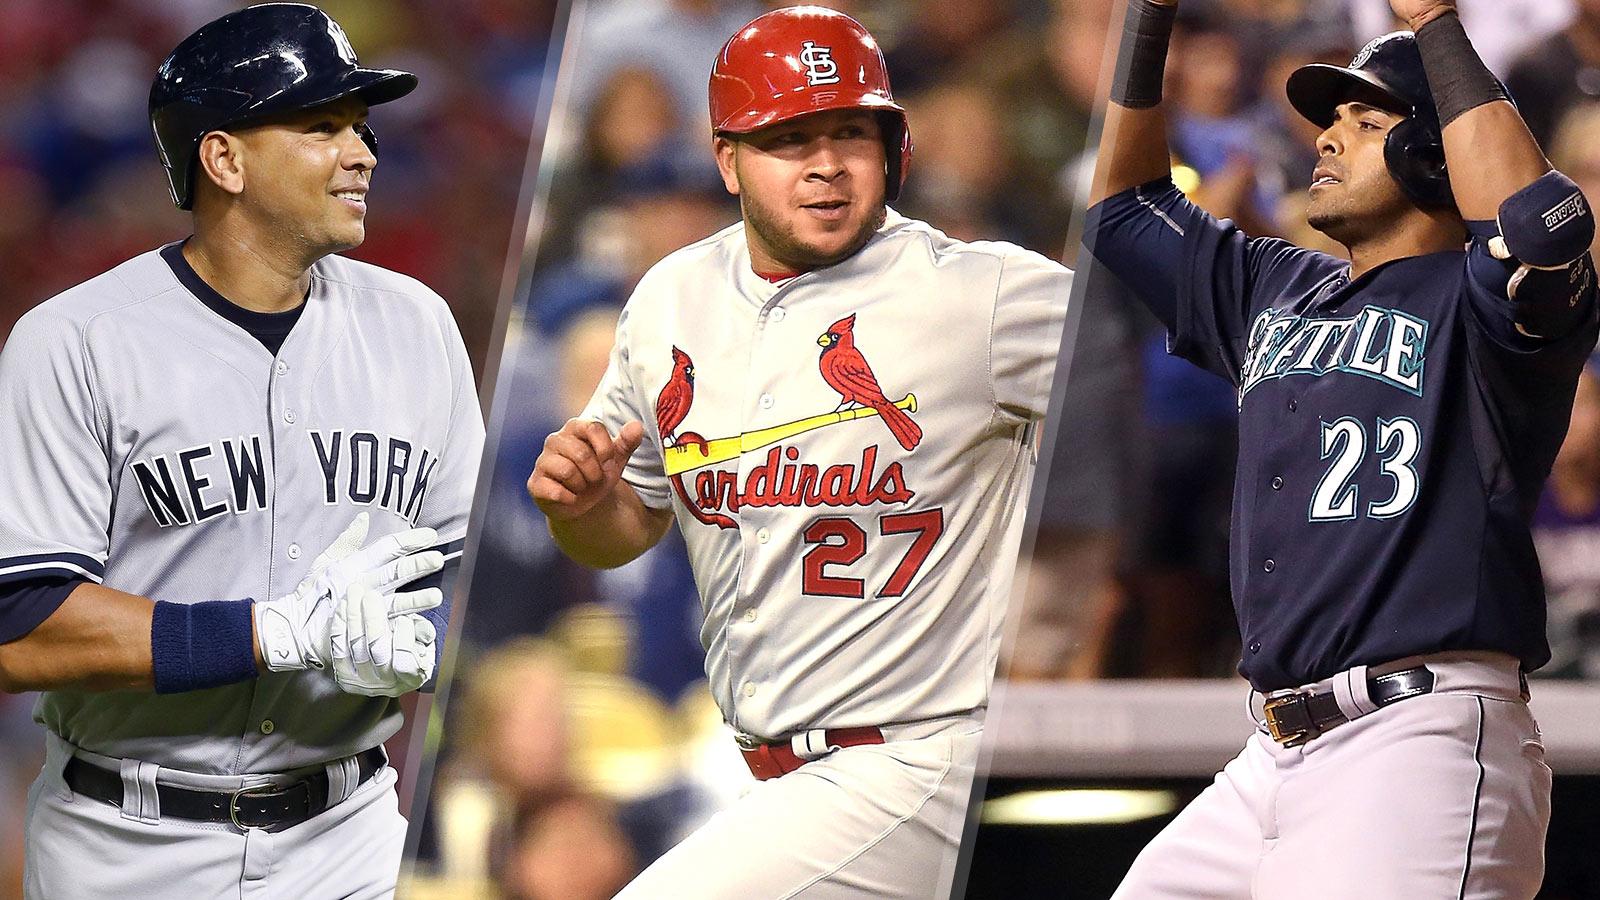 Biogenesis bounce-backs: A-Rod, Cruz, Peralta have regained All-Star form